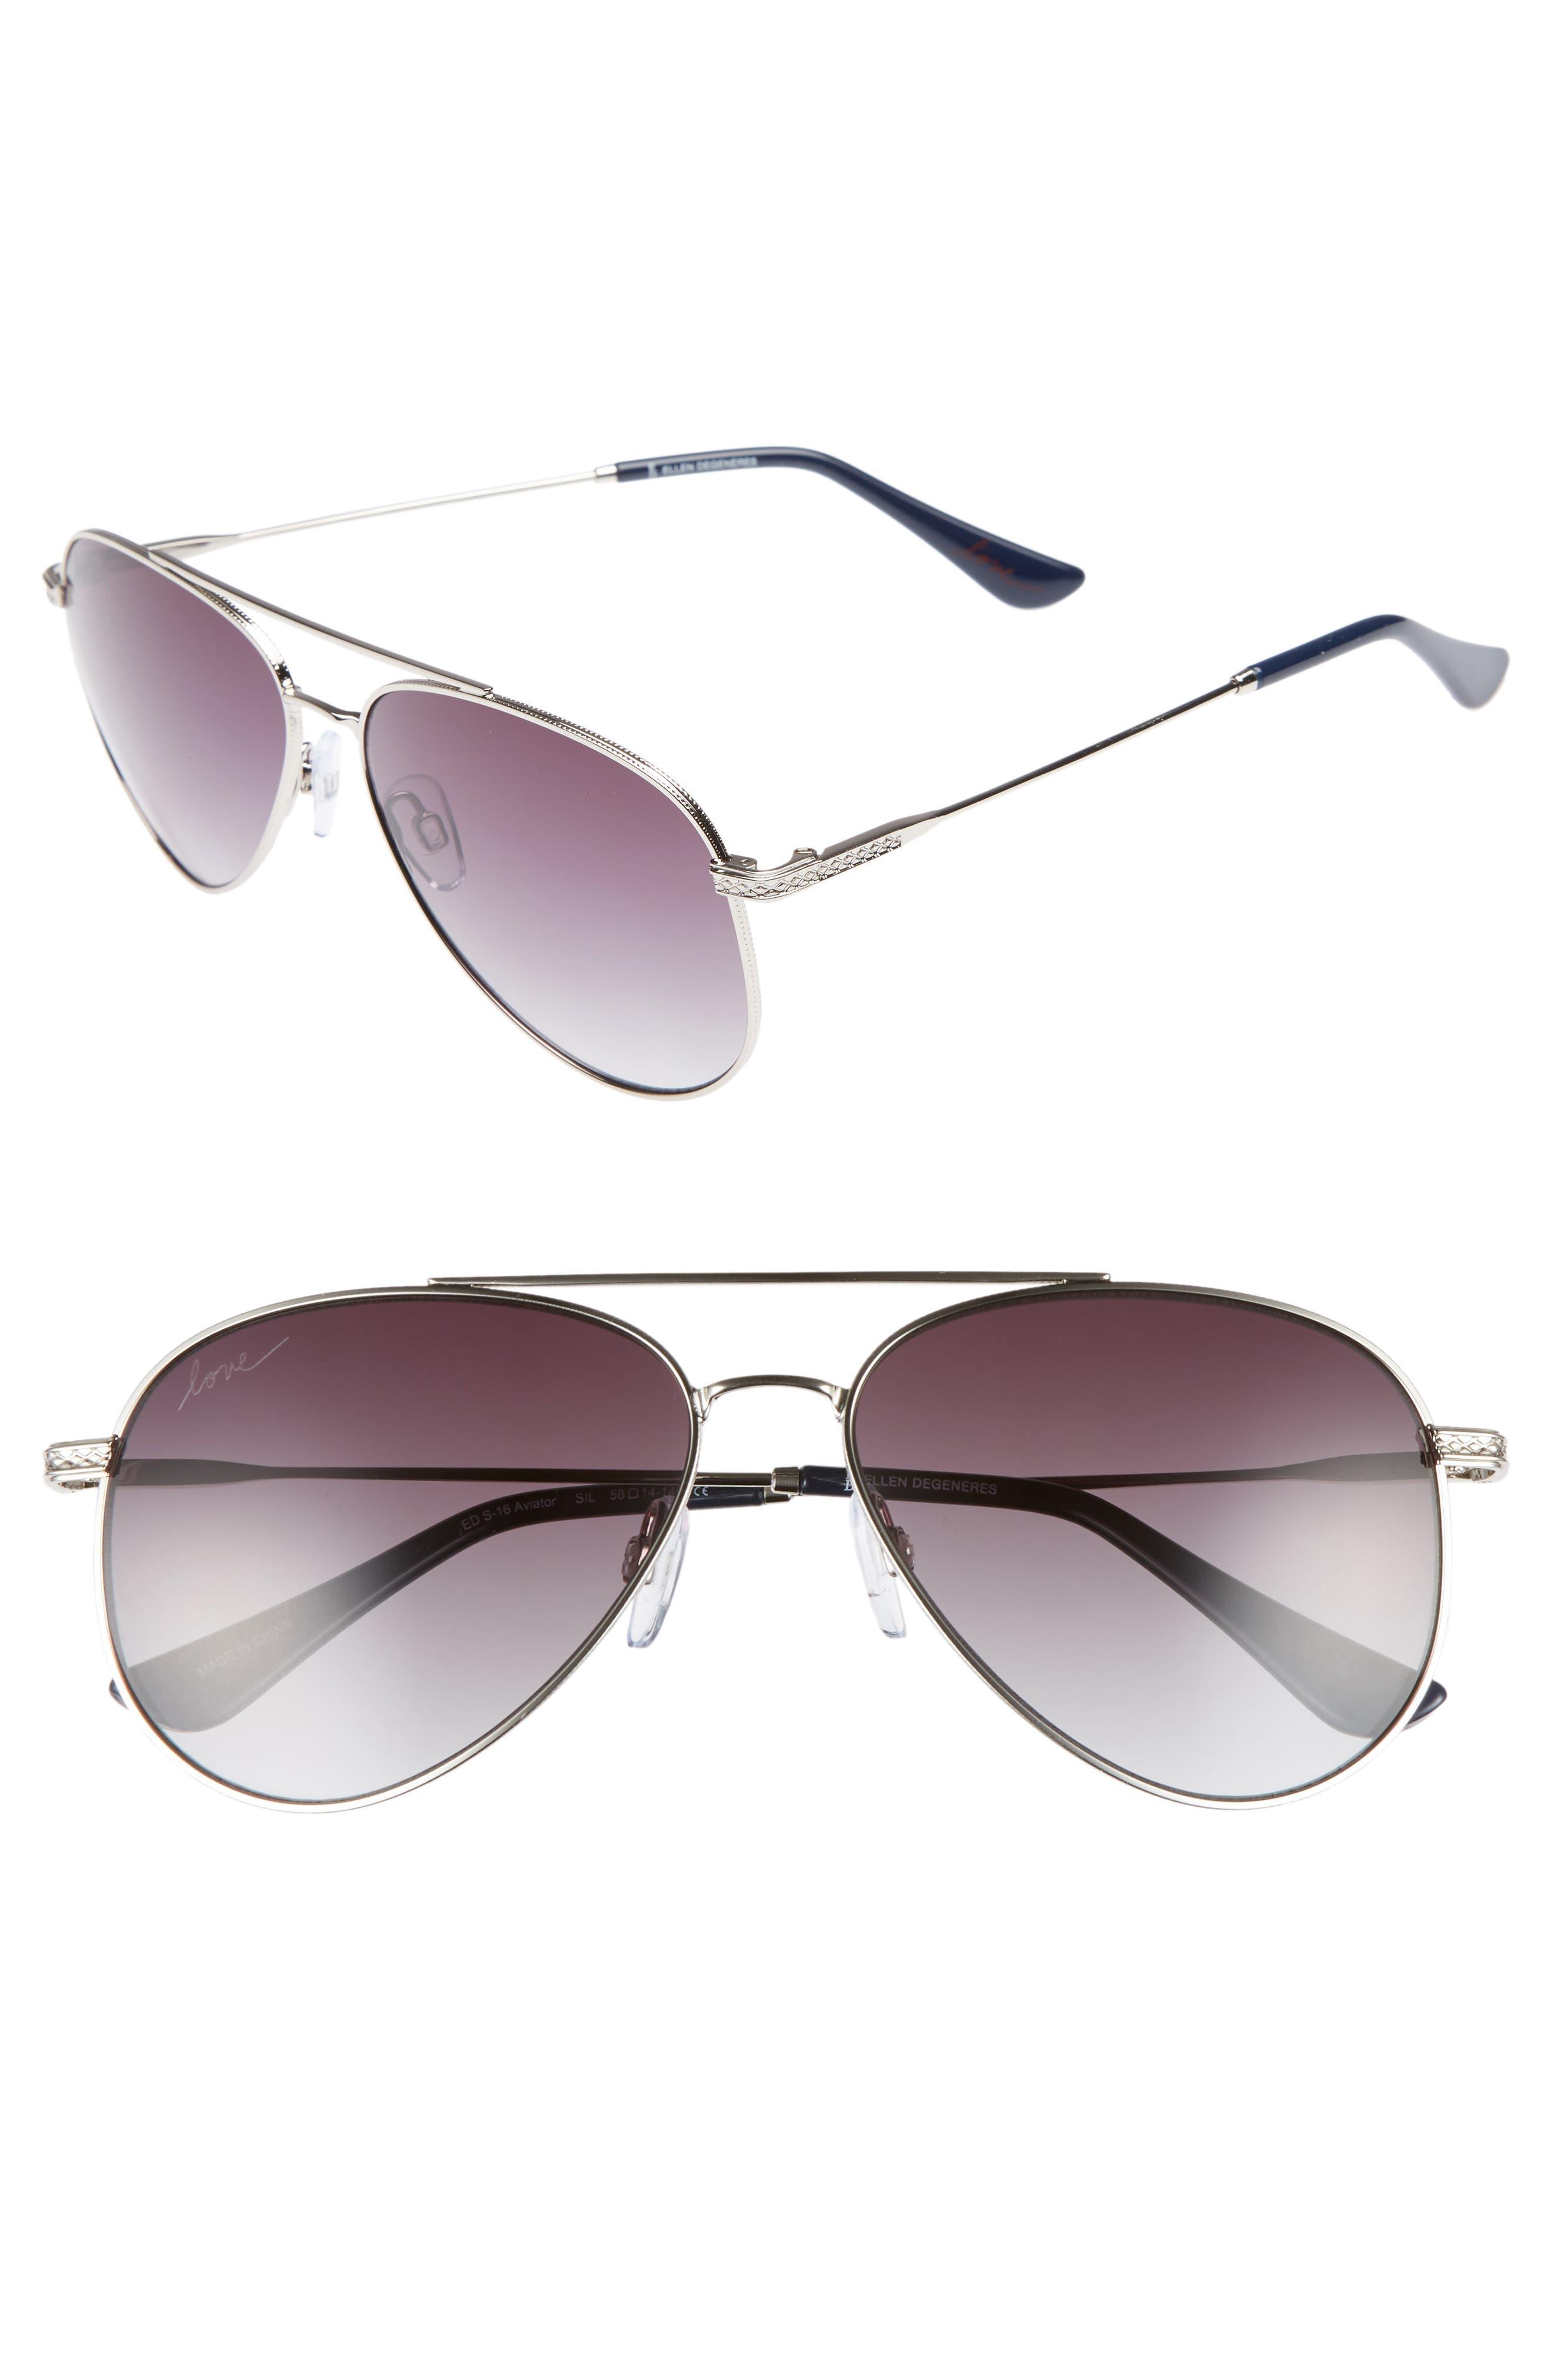 58mm Aviator Sunglasses,                         Main,                         color,